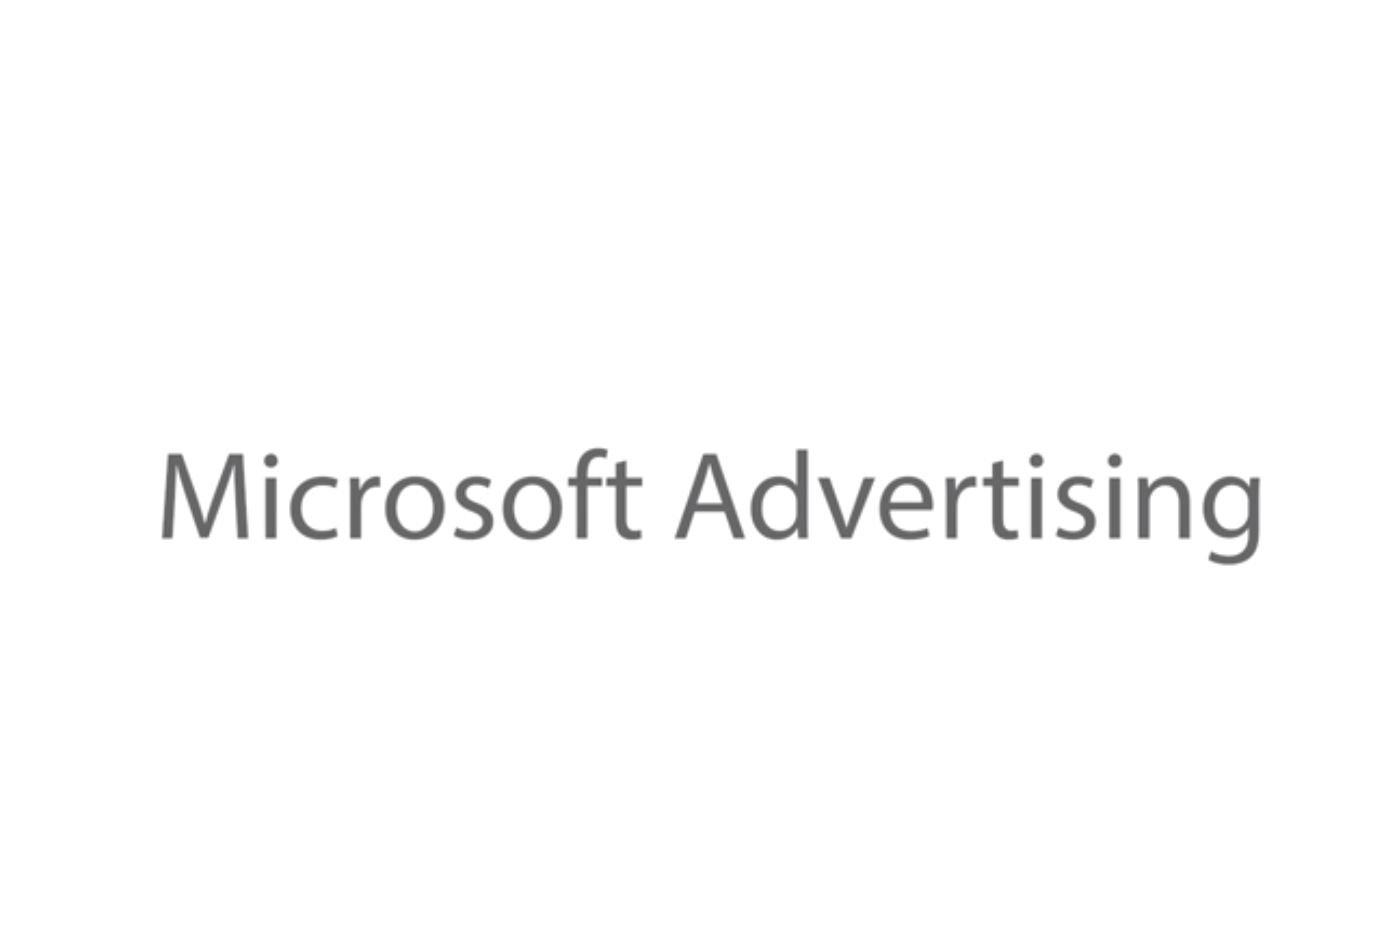 Microsoft-Advertising-1